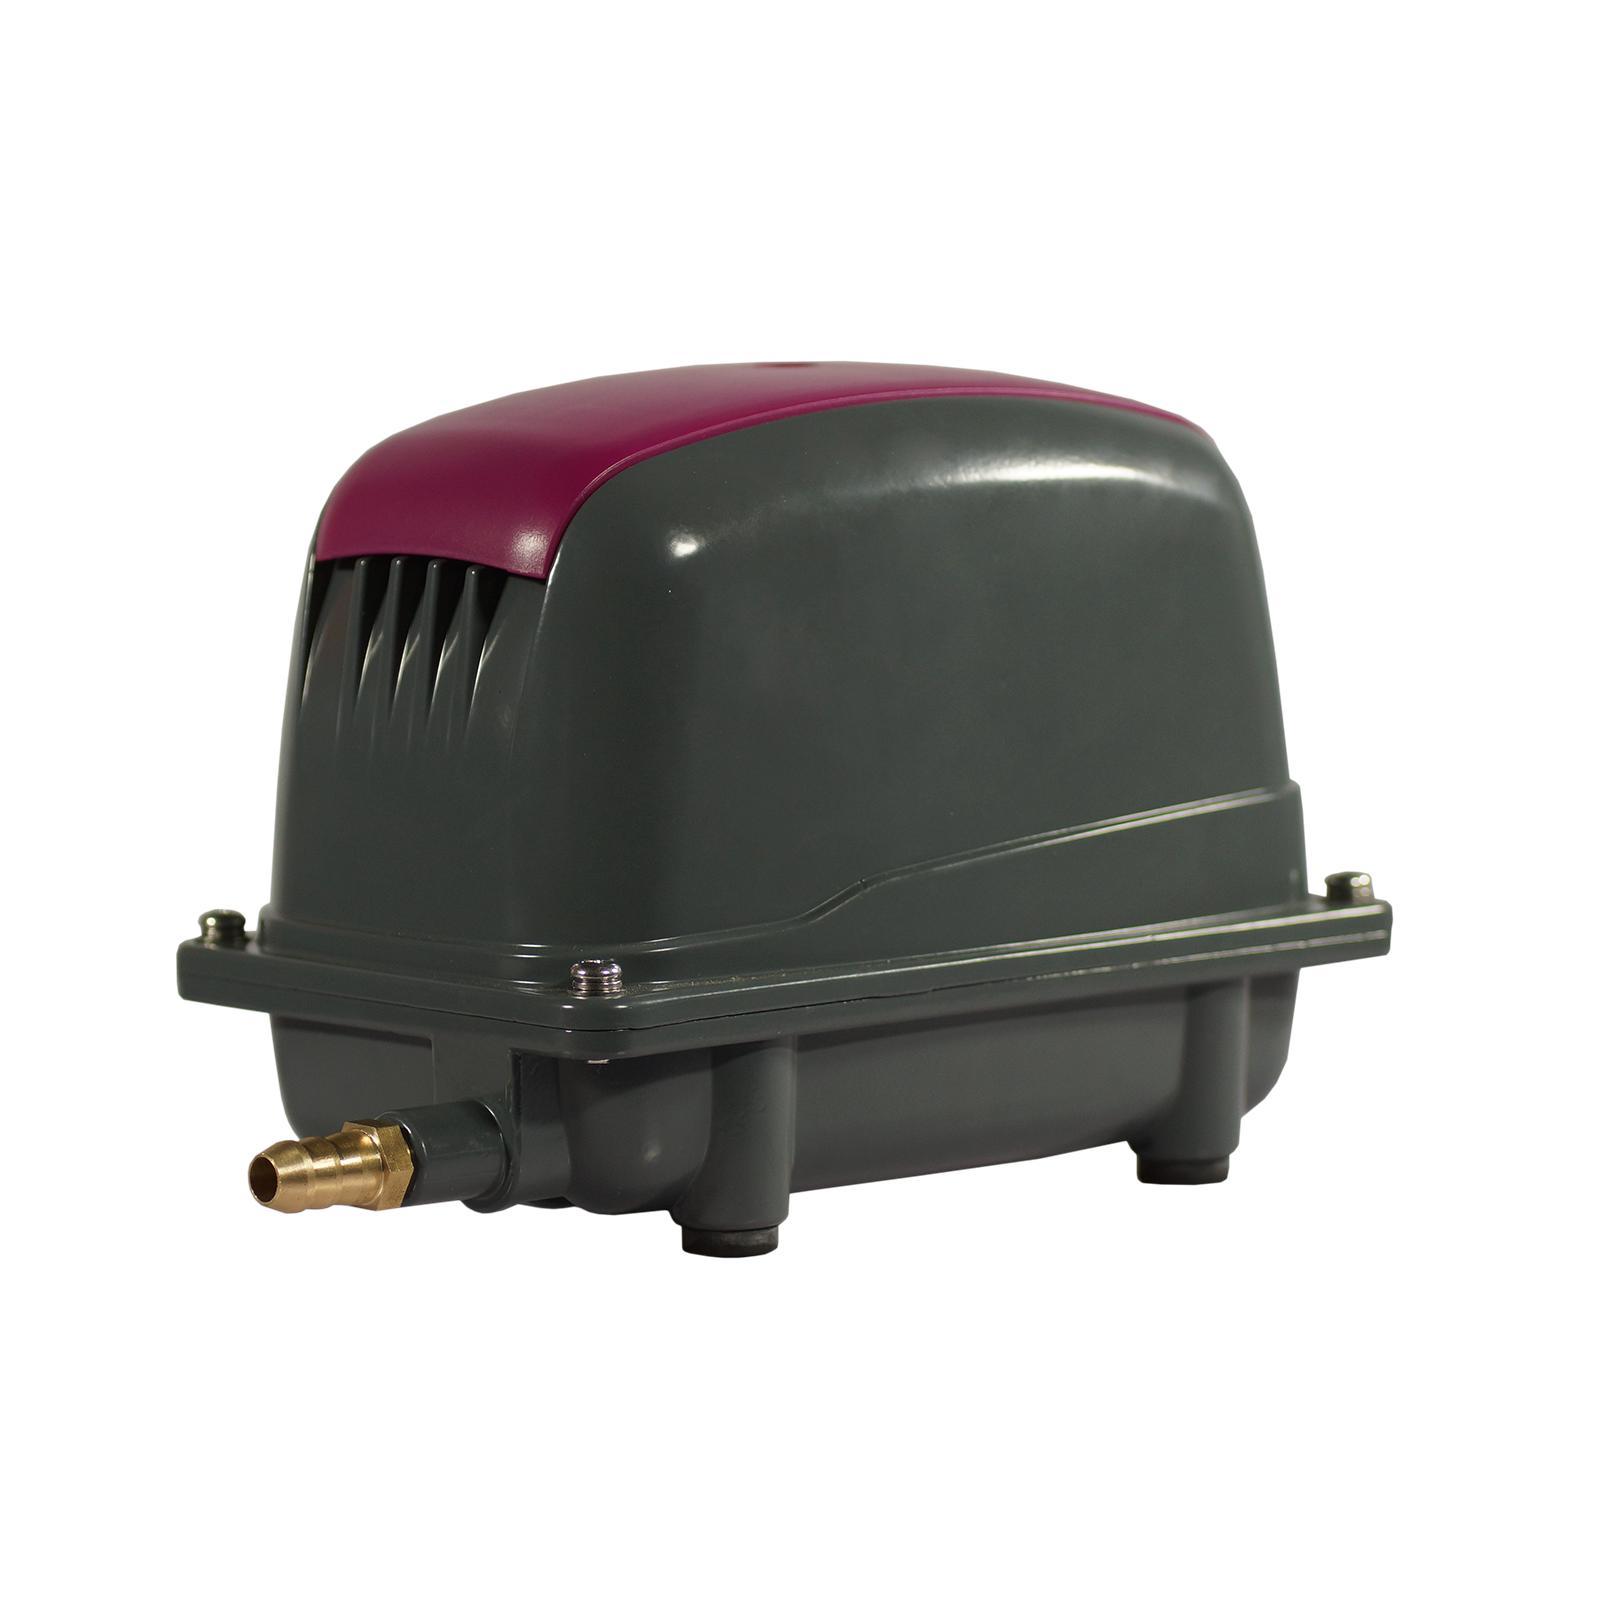 AQUA MEDIC Mistral 2000 V2 pompe à air 2100 L/h à membrane pour aquarium